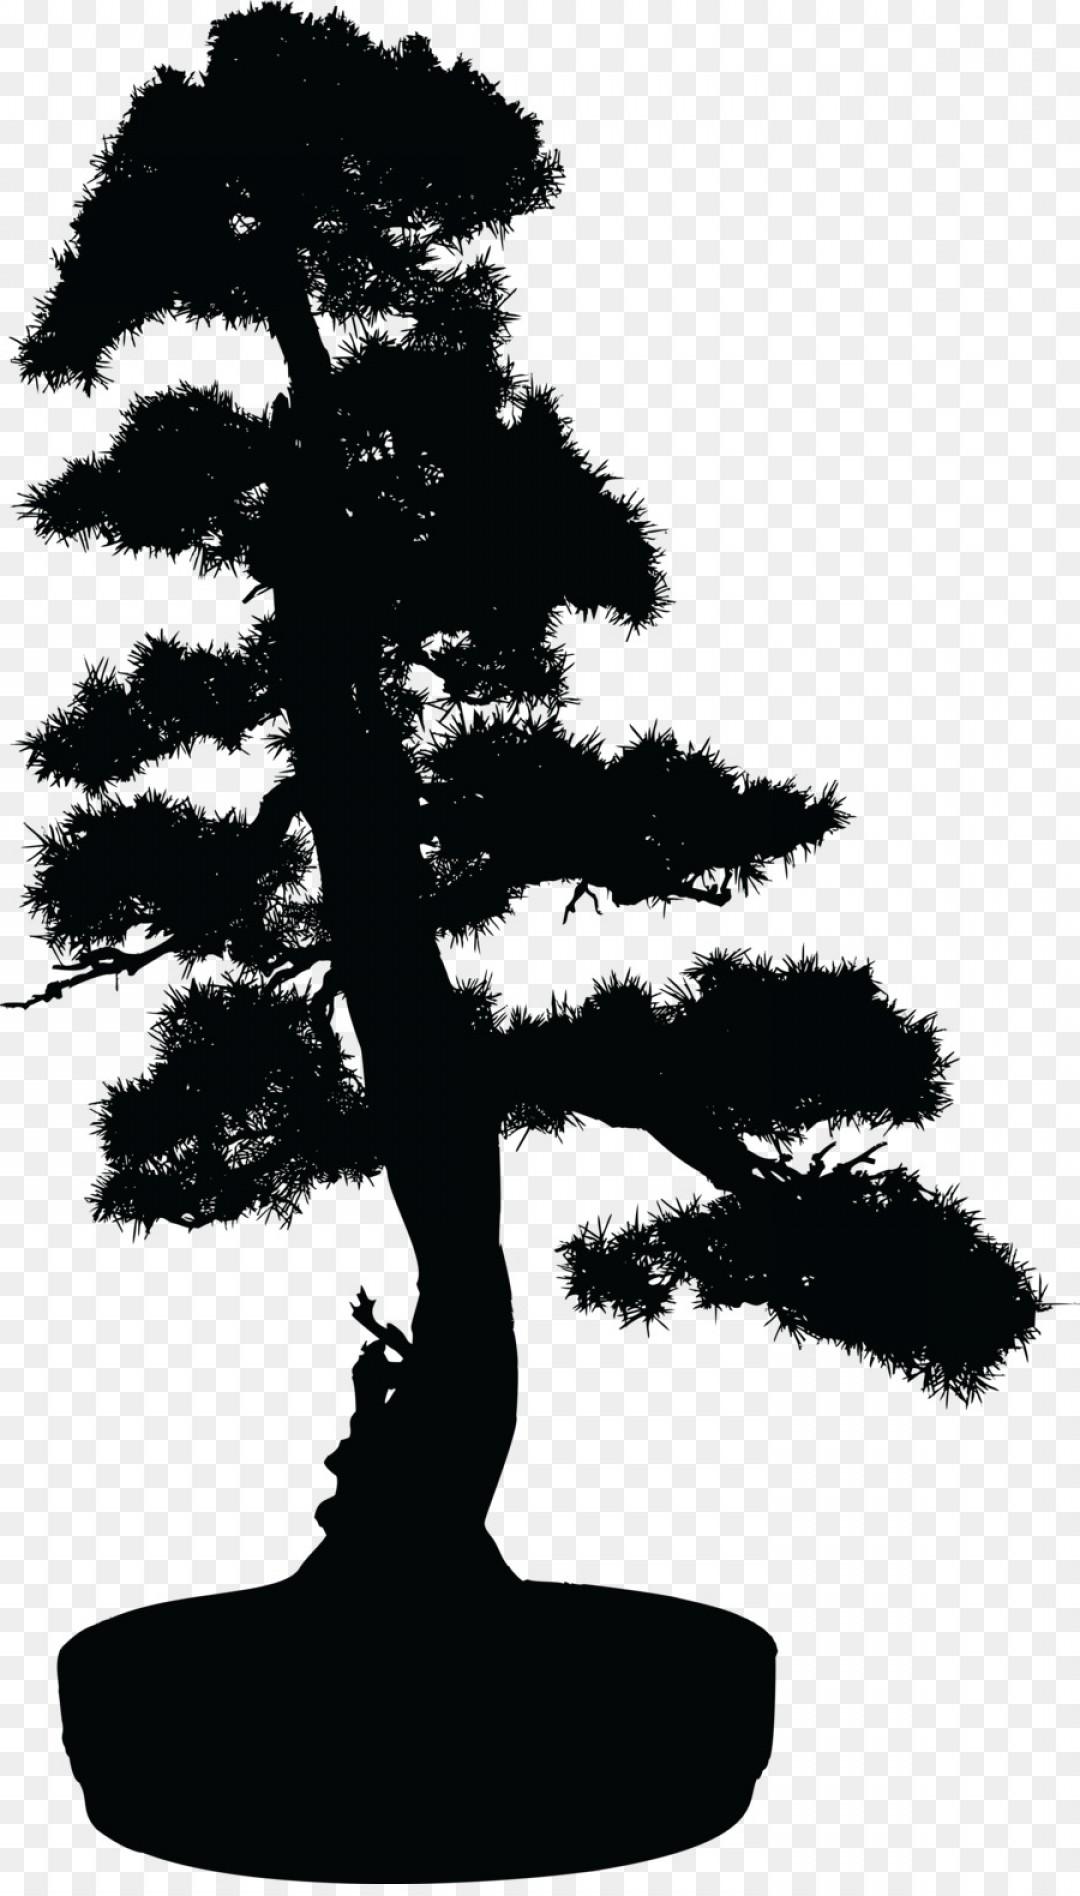 Bonsai tree silhouette clipart banner black and white stock Bonsai Tree Silhouette Clip Art Vector Bonsai Tree In A Pot Black ... banner black and white stock